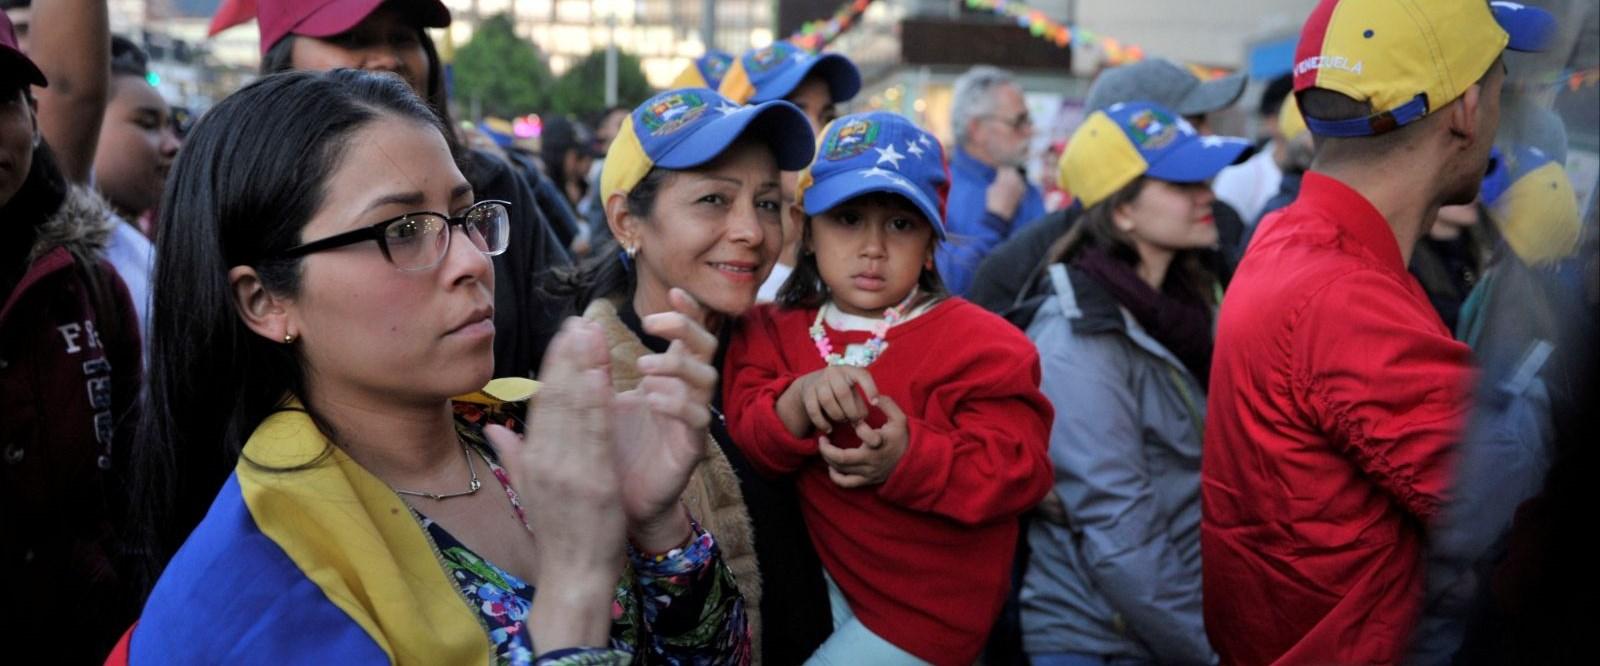 2019-05-02T003302Z_2009860000_RC11AE14C4F0_RTRMADP_3_VENEZUELA-POLITICS-COLOMBIA.JPG